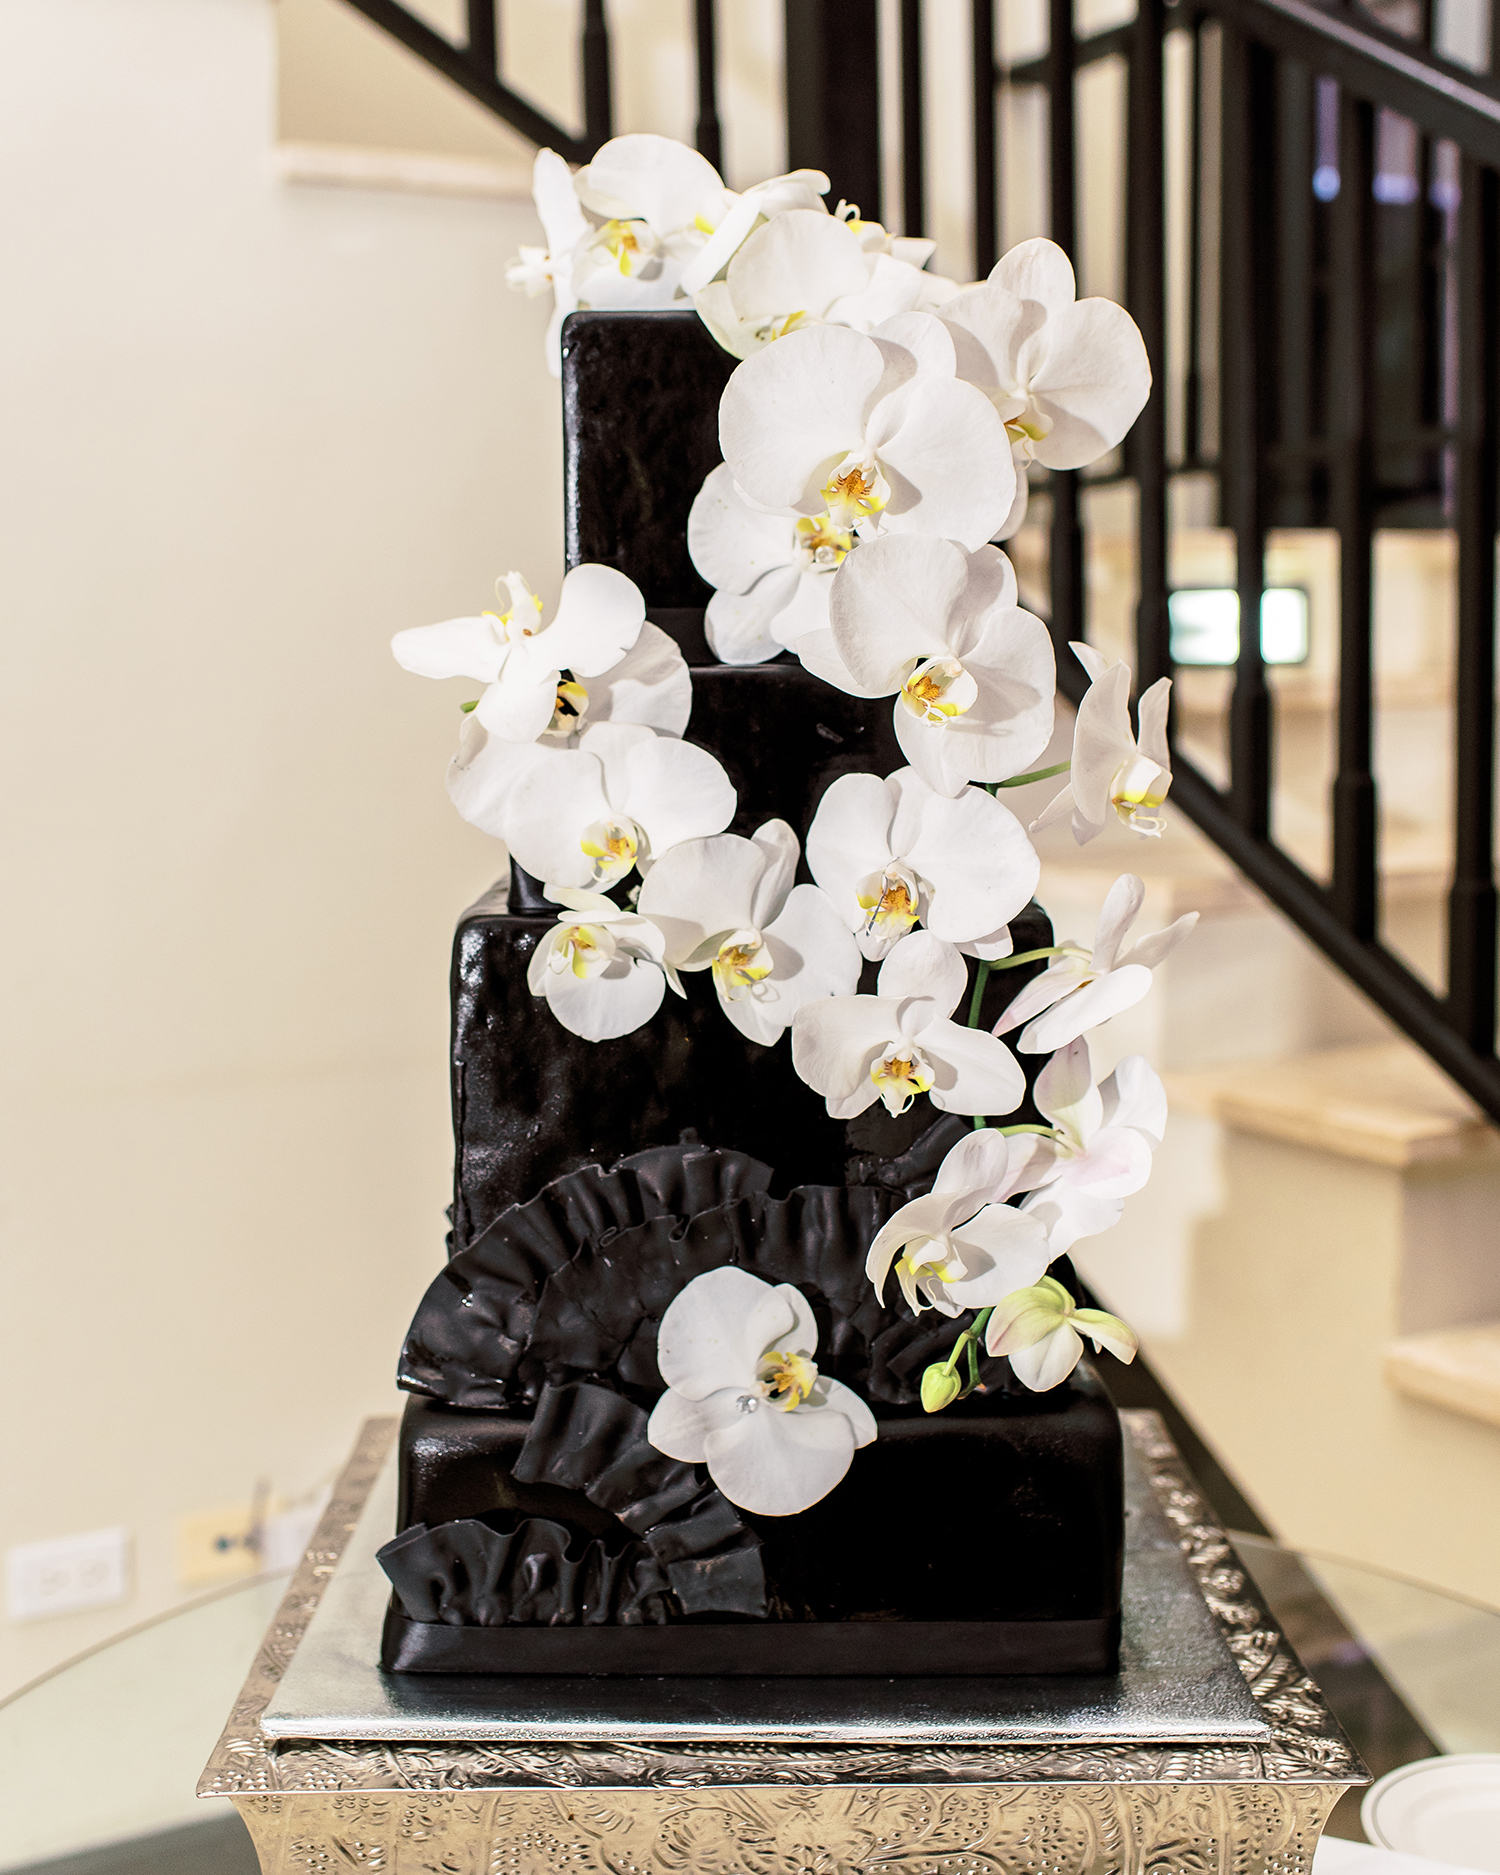 melissa leighton black ruffled white flower wedding cake